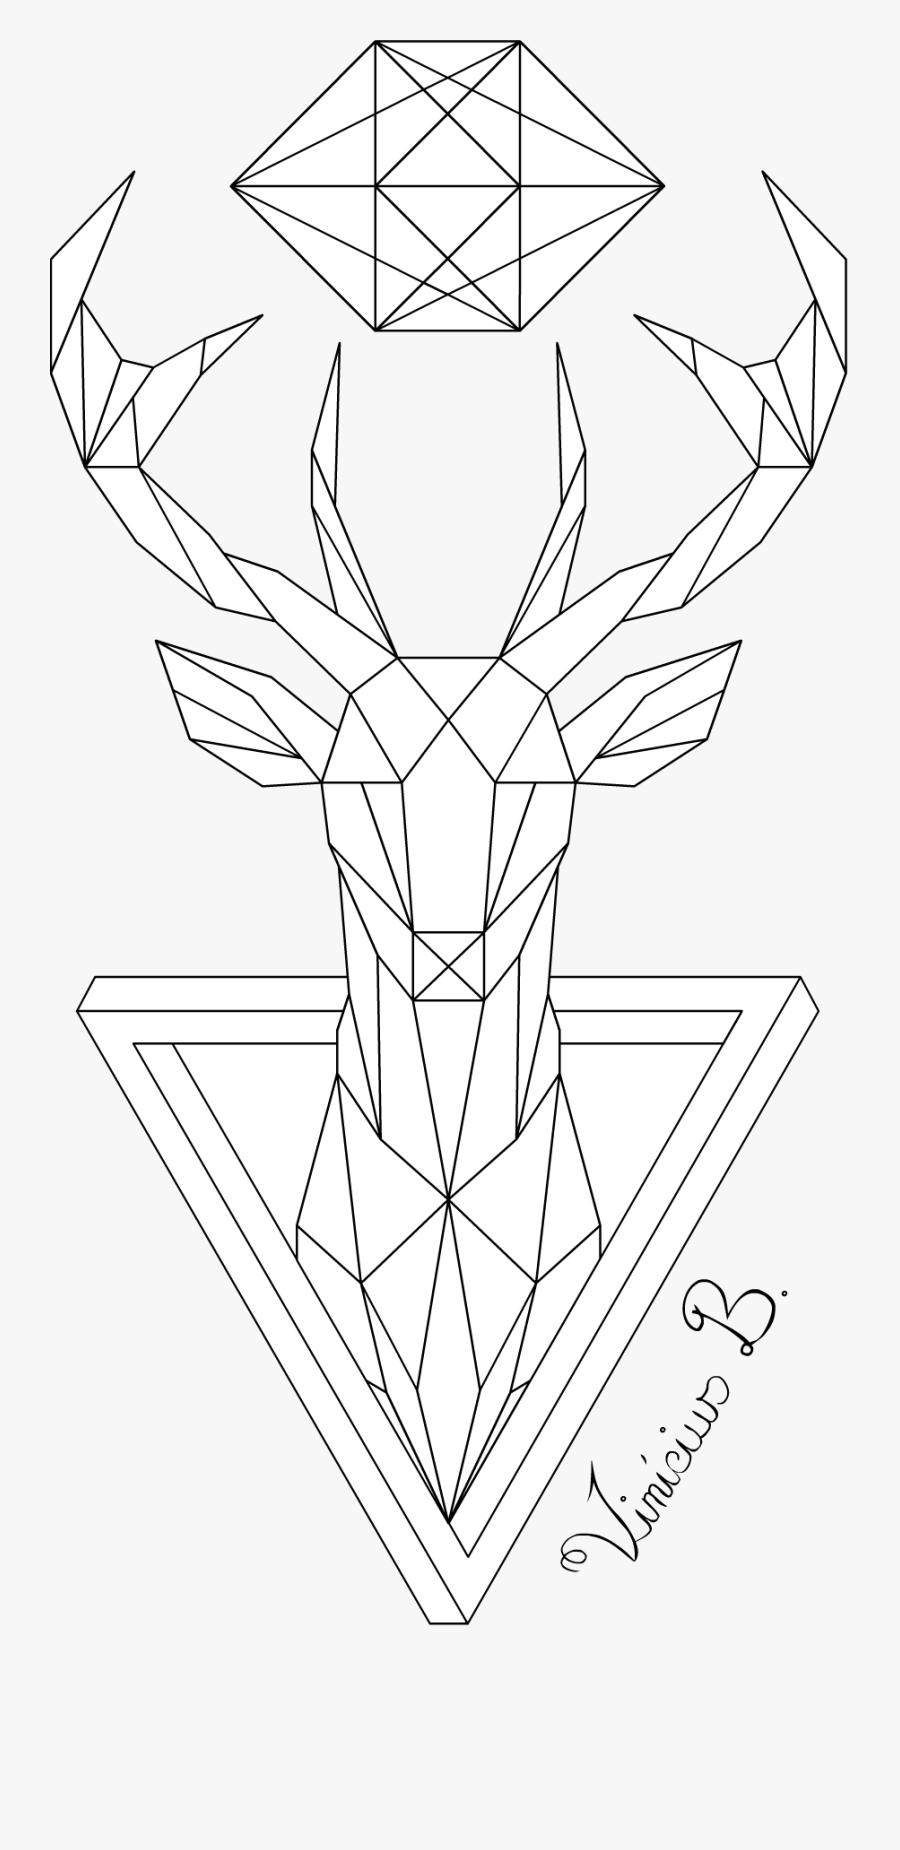 Geometrical Drawing Wild Animal - Deer Drawing Geometric, Transparent Clipart